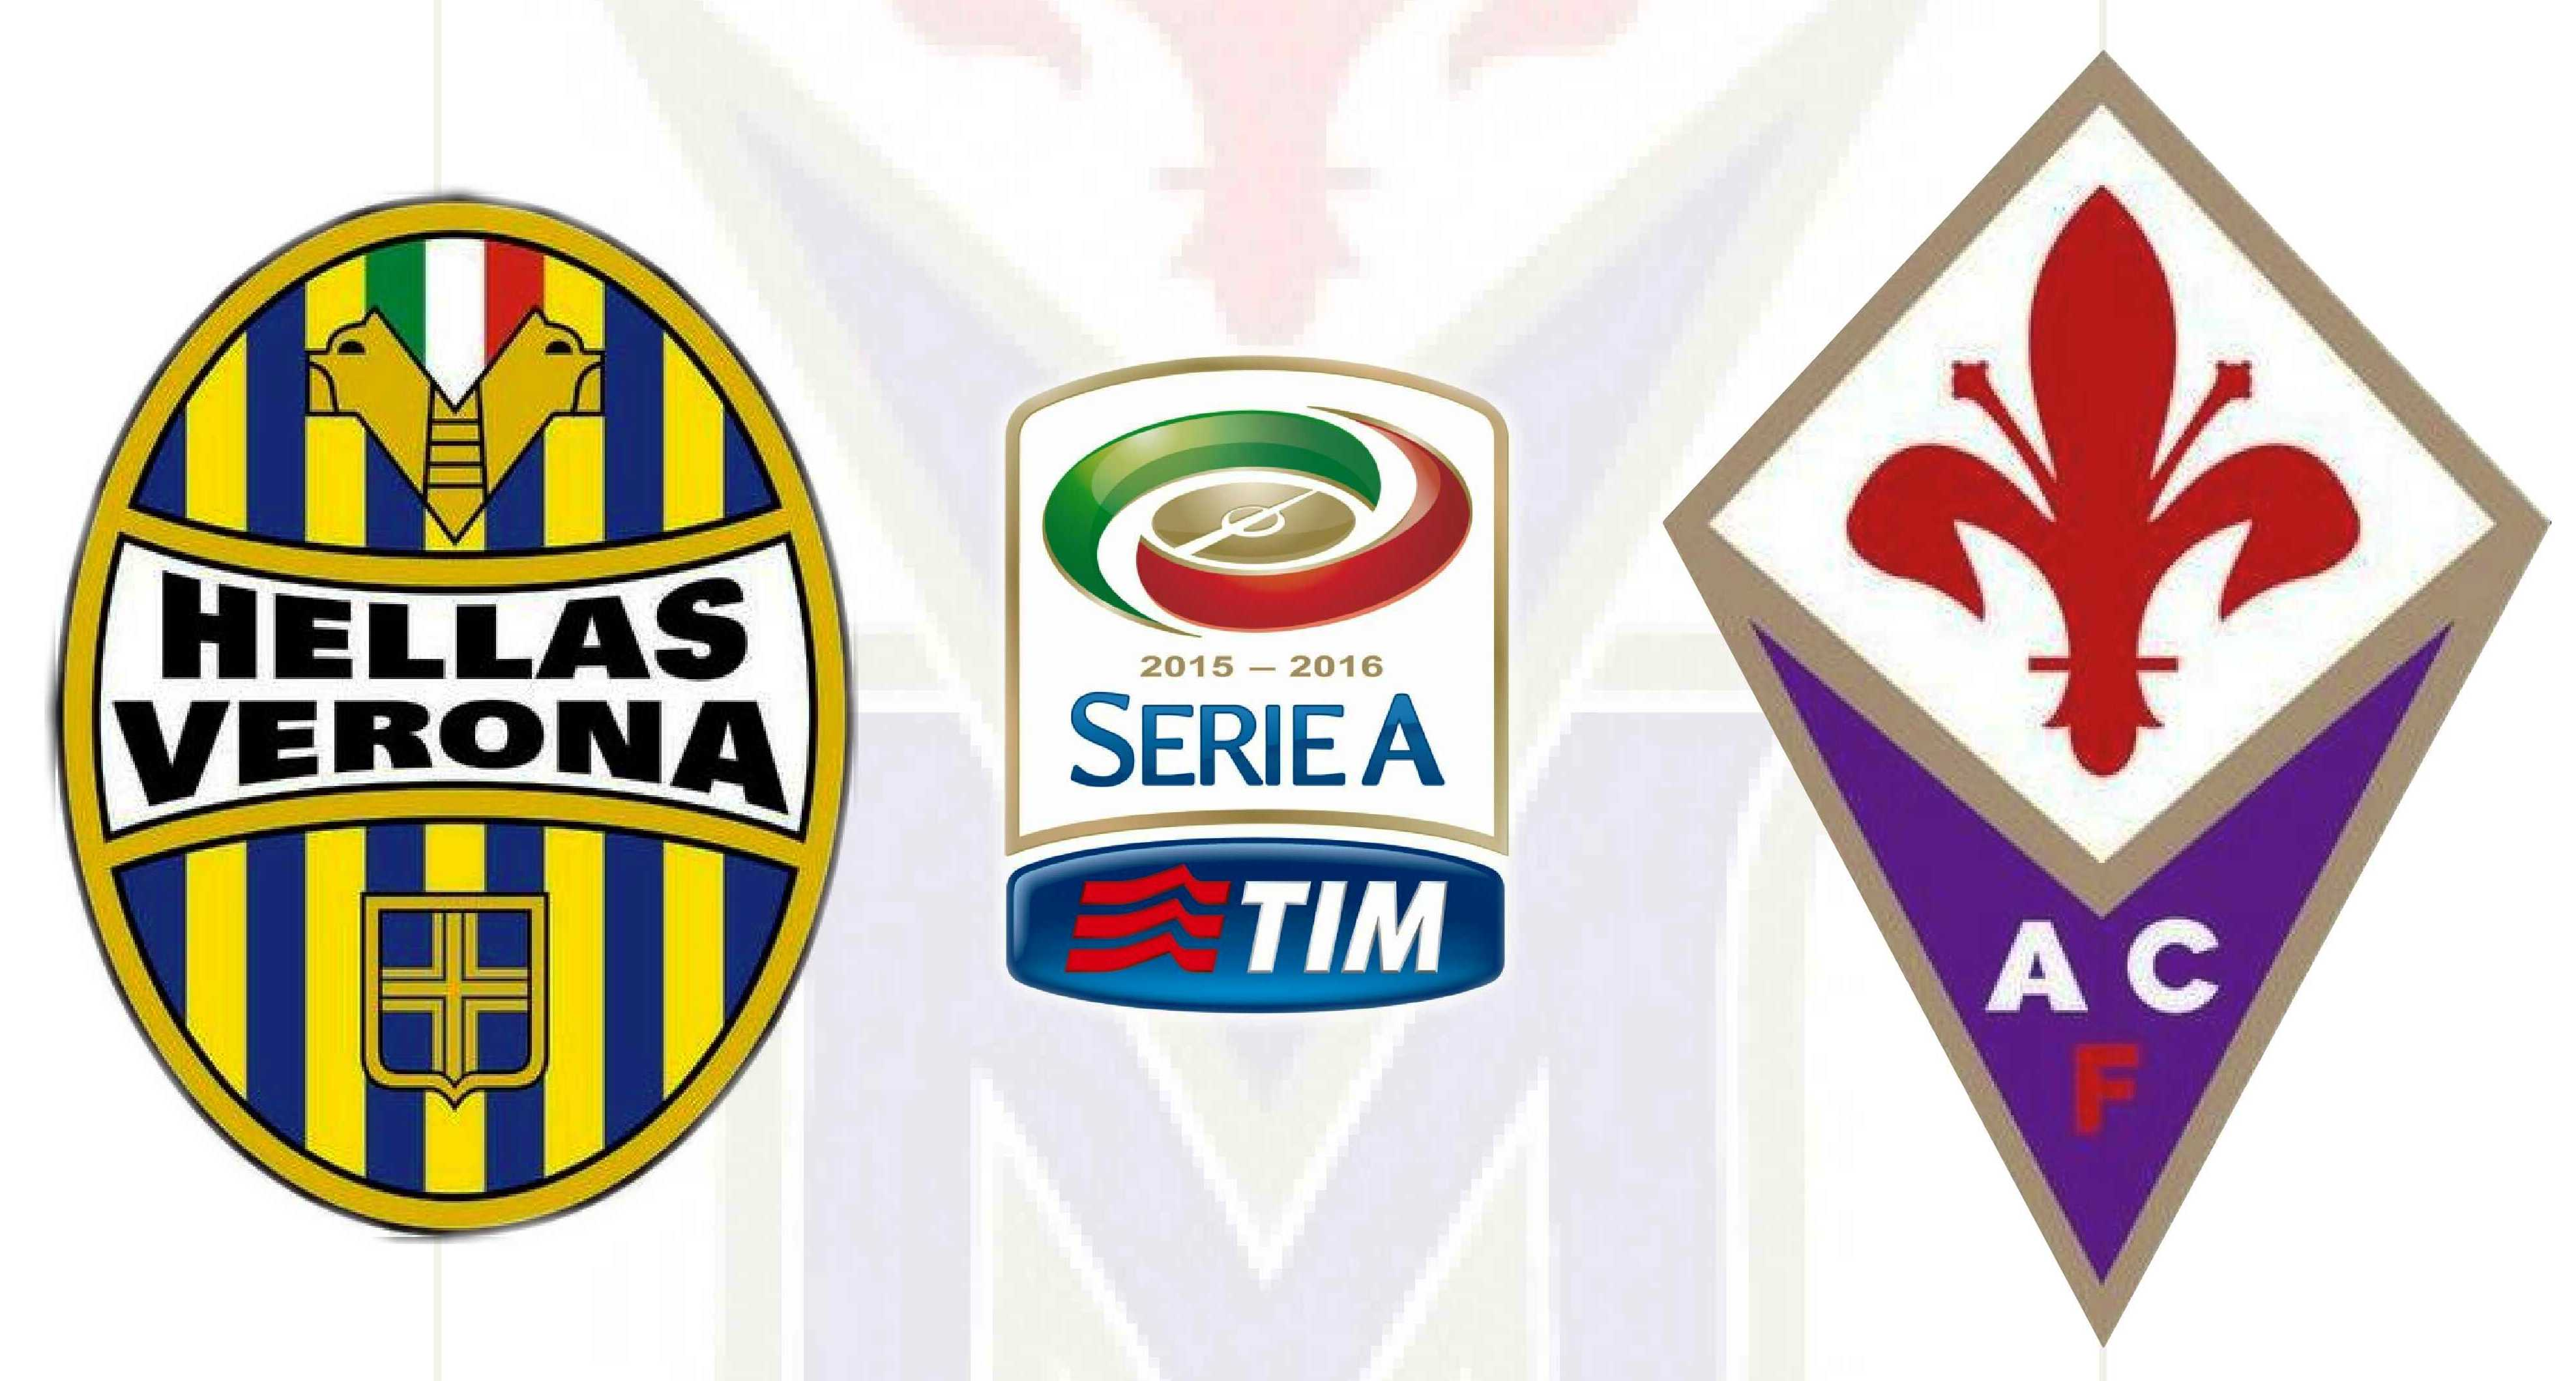 Verona-Fiorentina-logo-2015-2016